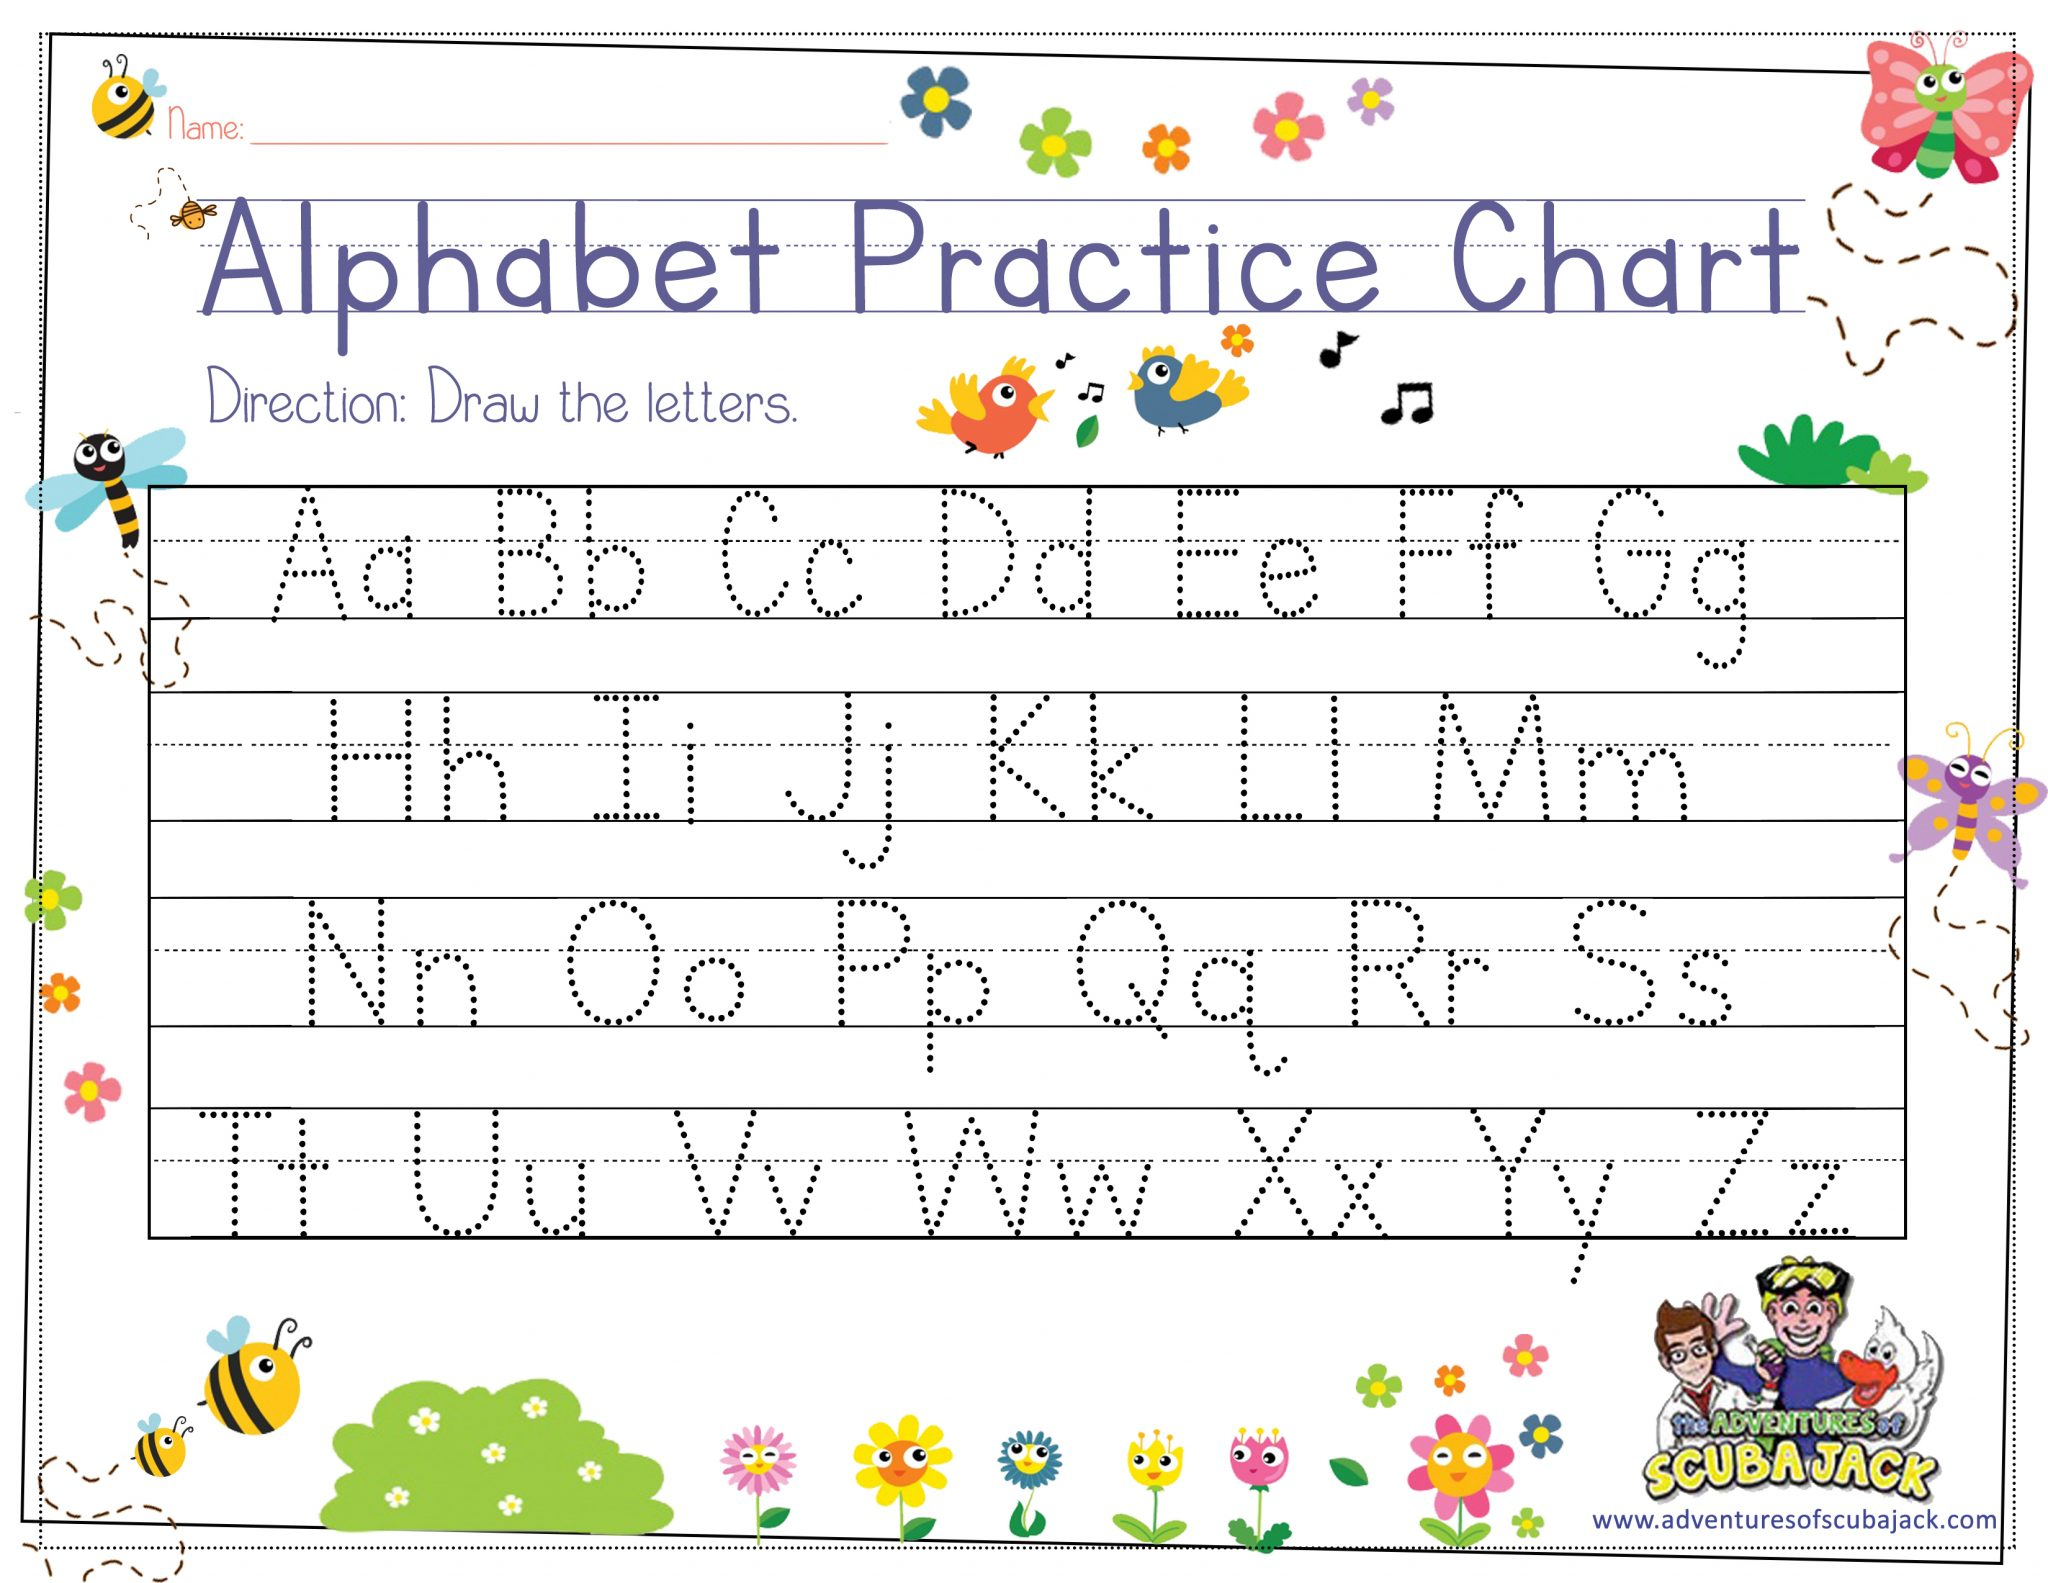 Alphabet Tracing For Preschoolers   The Preschool Adventures within Alphabet Tracing Chart